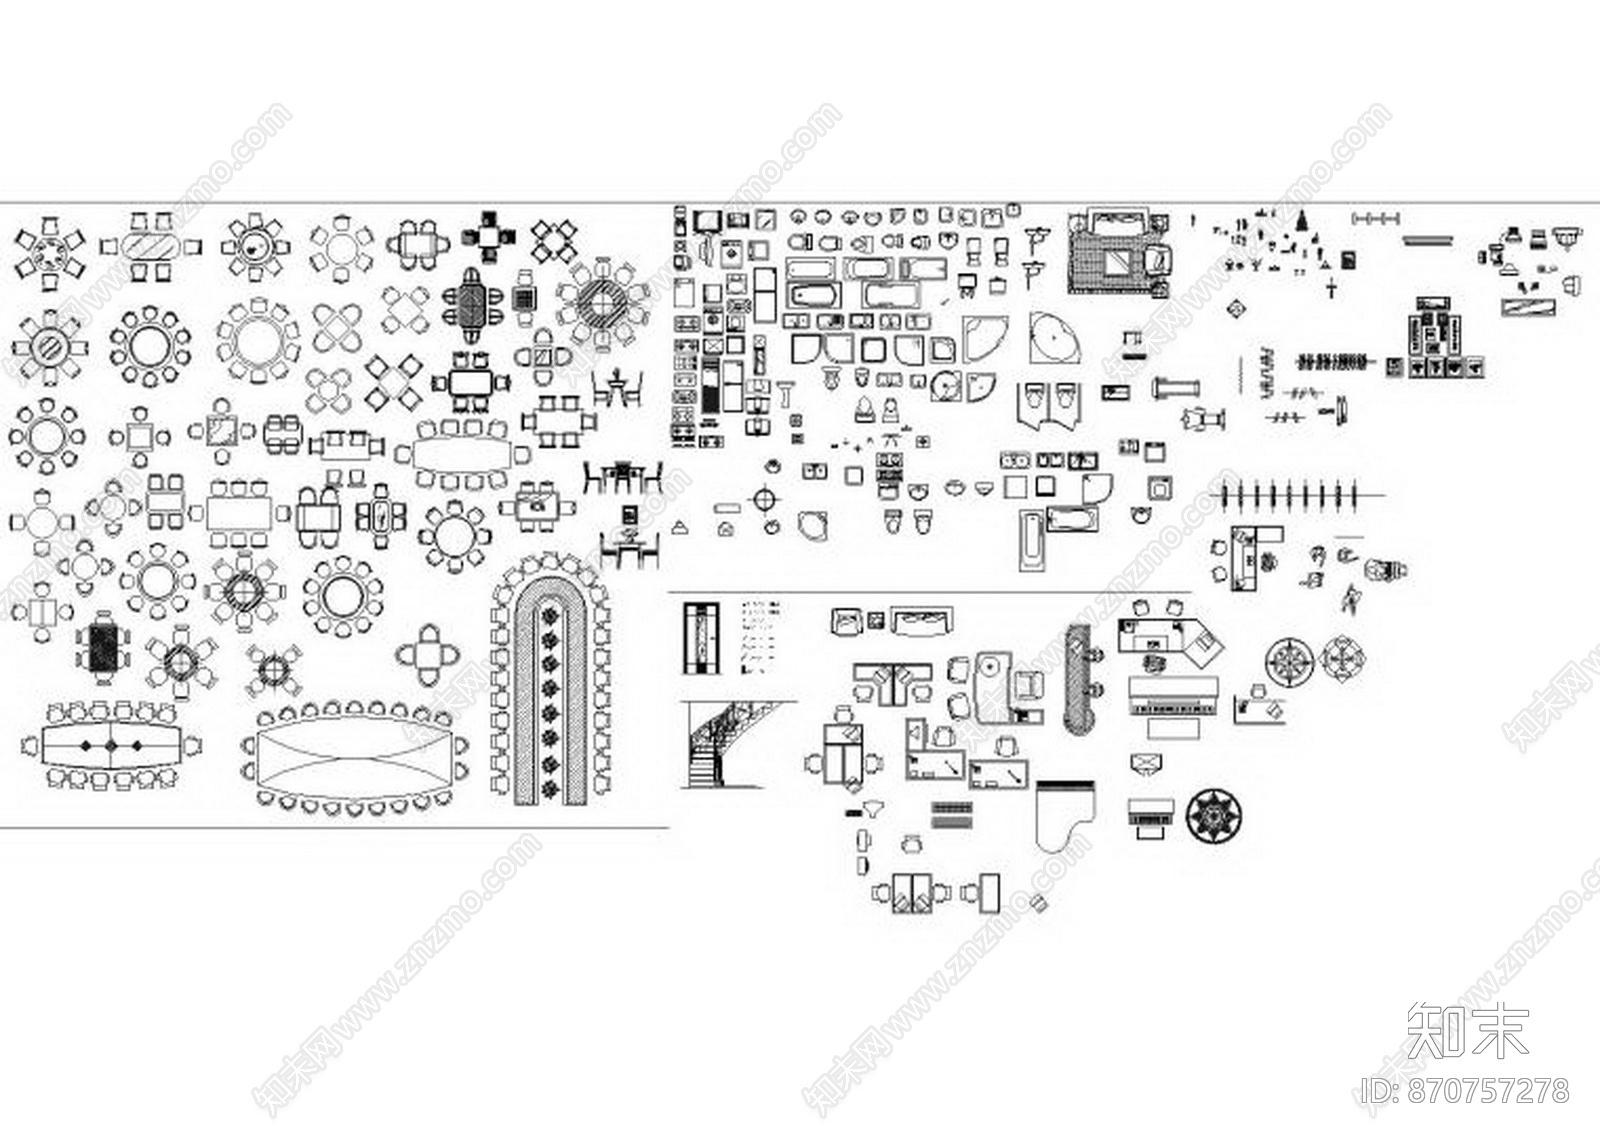 CAD完美图库施工图下载【ID:870757278】